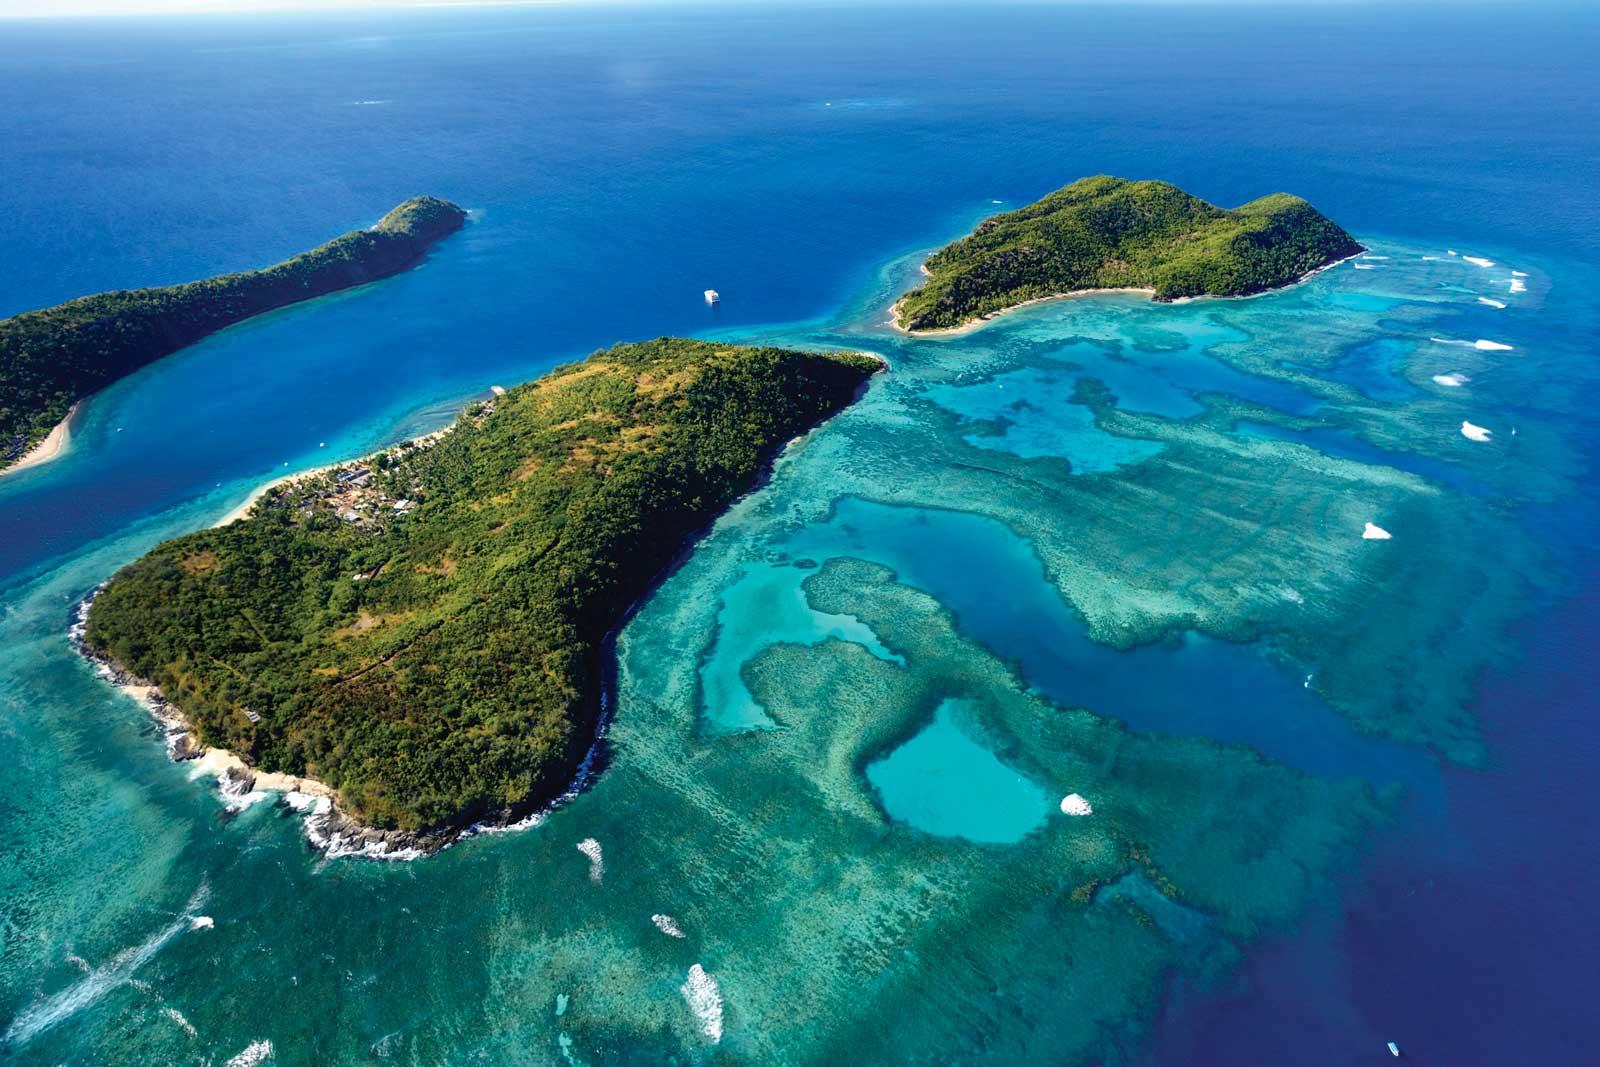 Fiji Luxury Itinerary: 3 Days